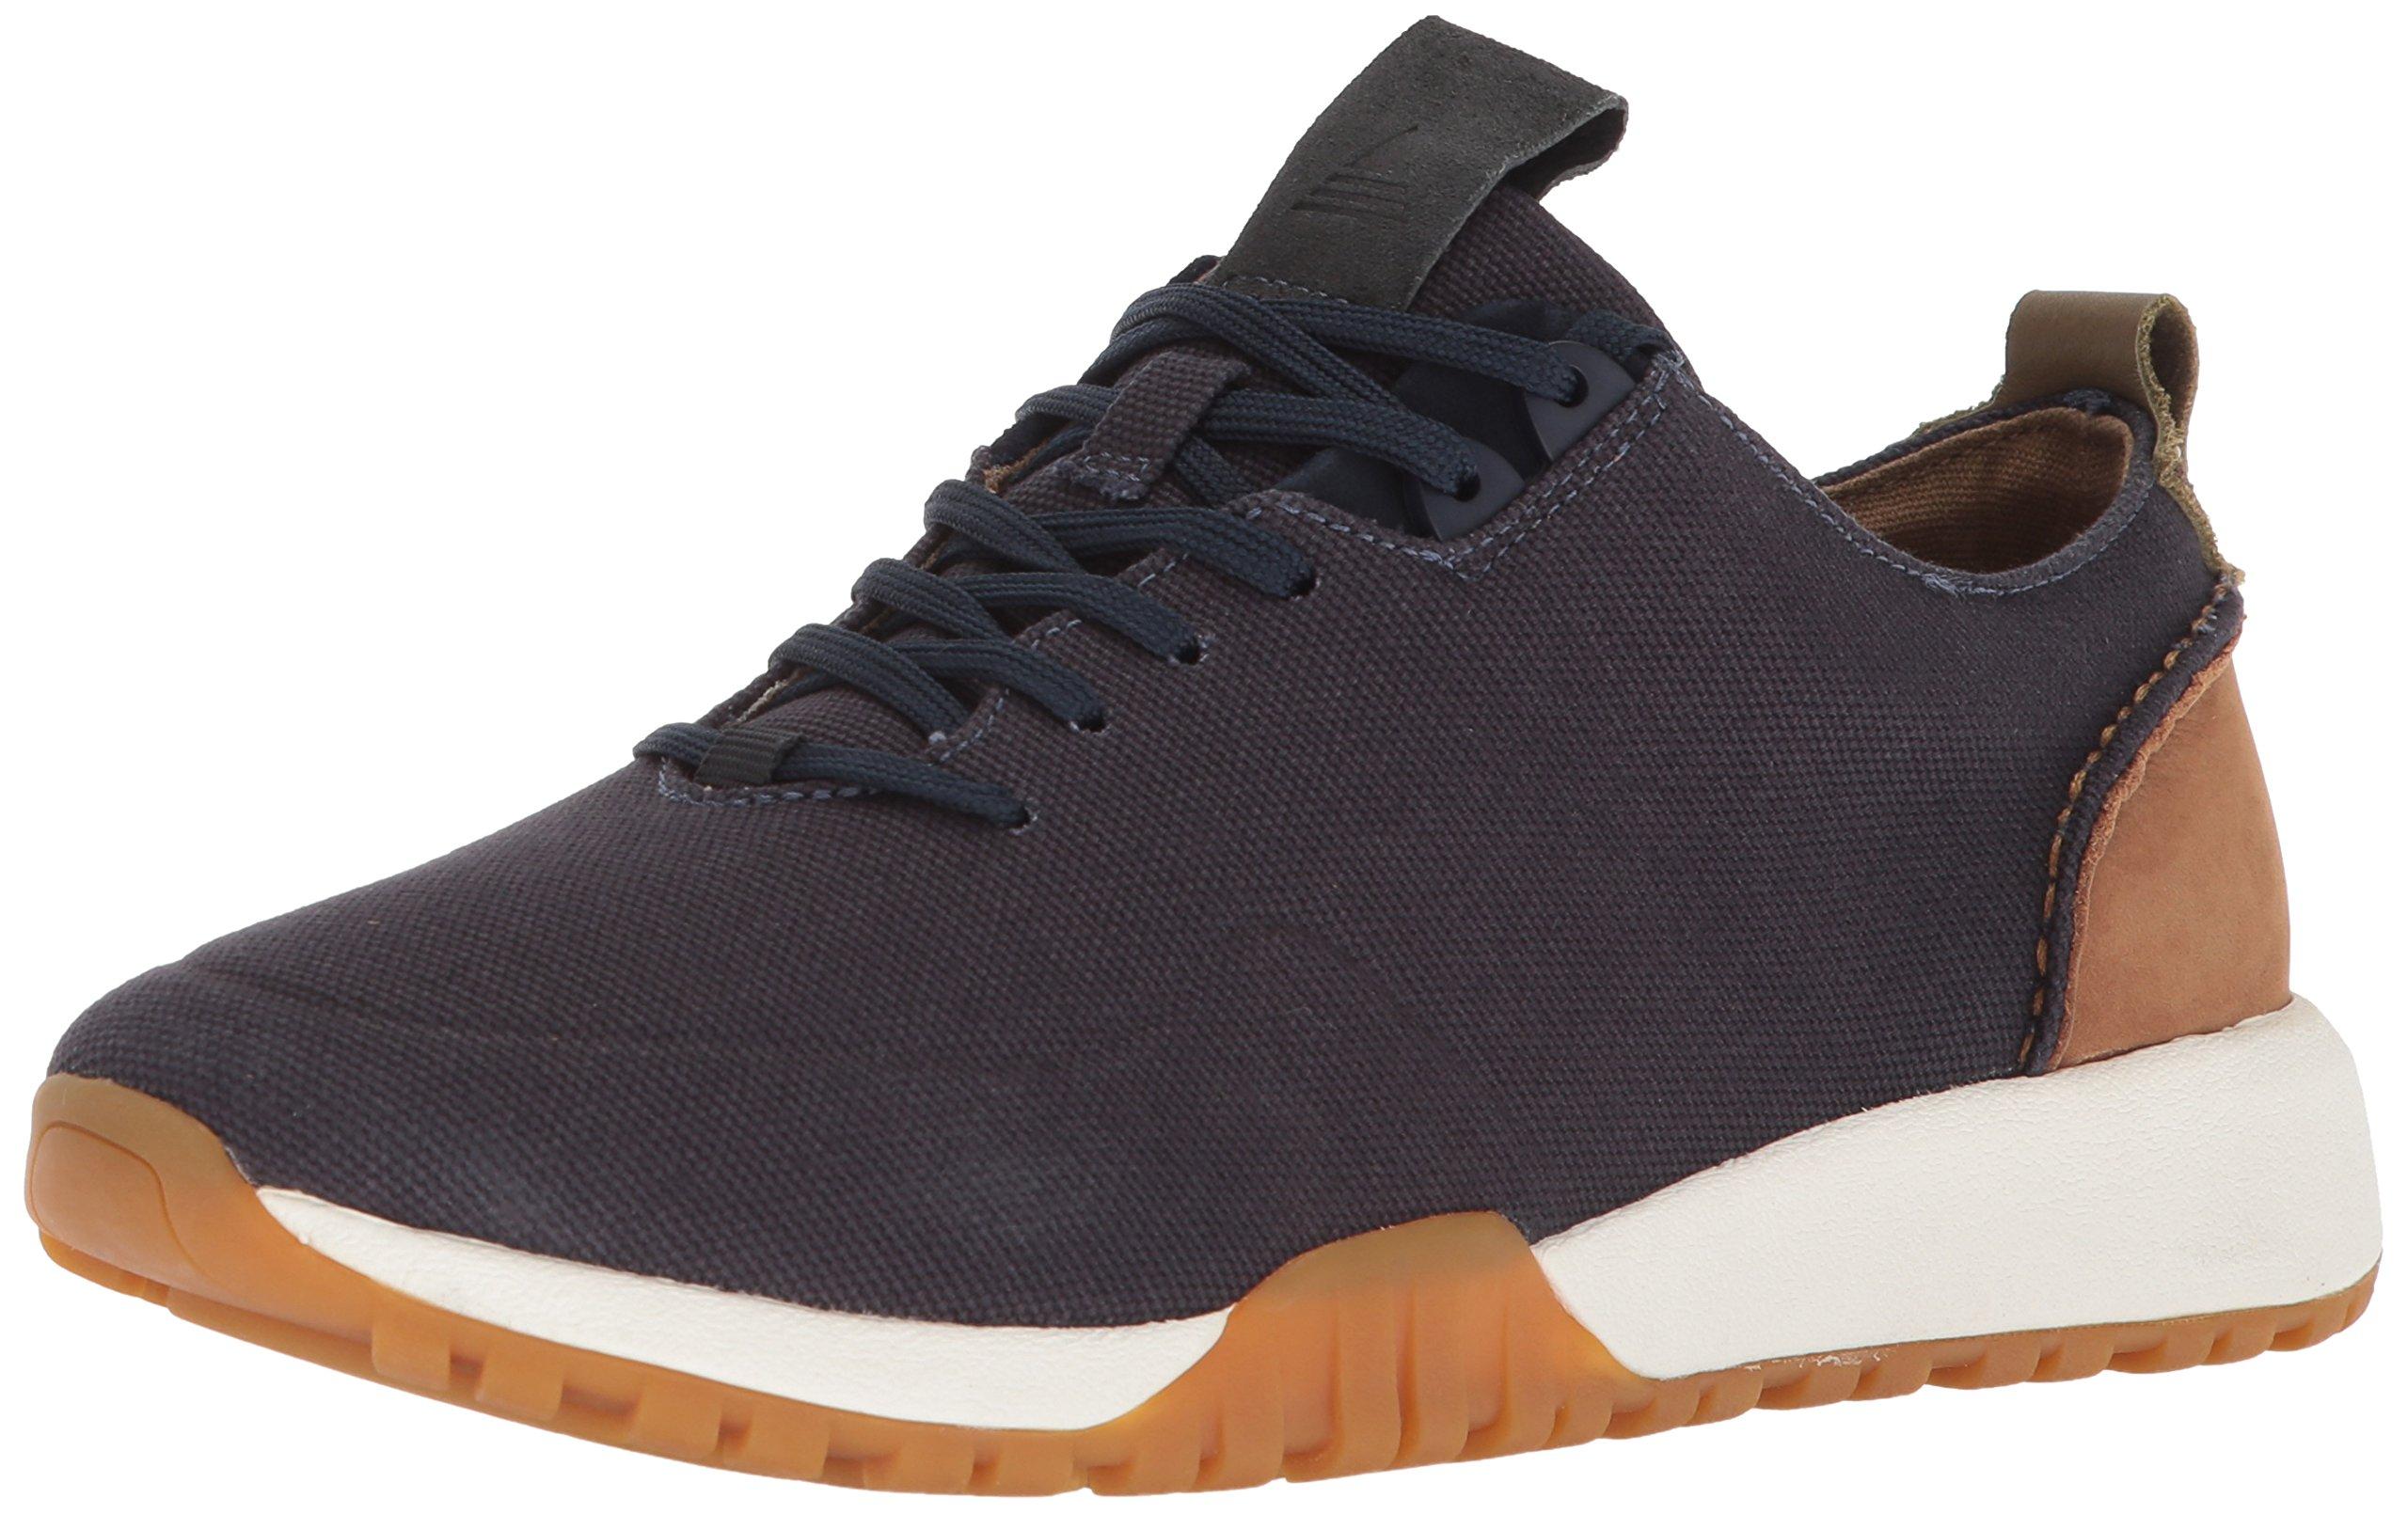 Aldo Men's RELLE Fashion Sneaker, Navy, 13 D US